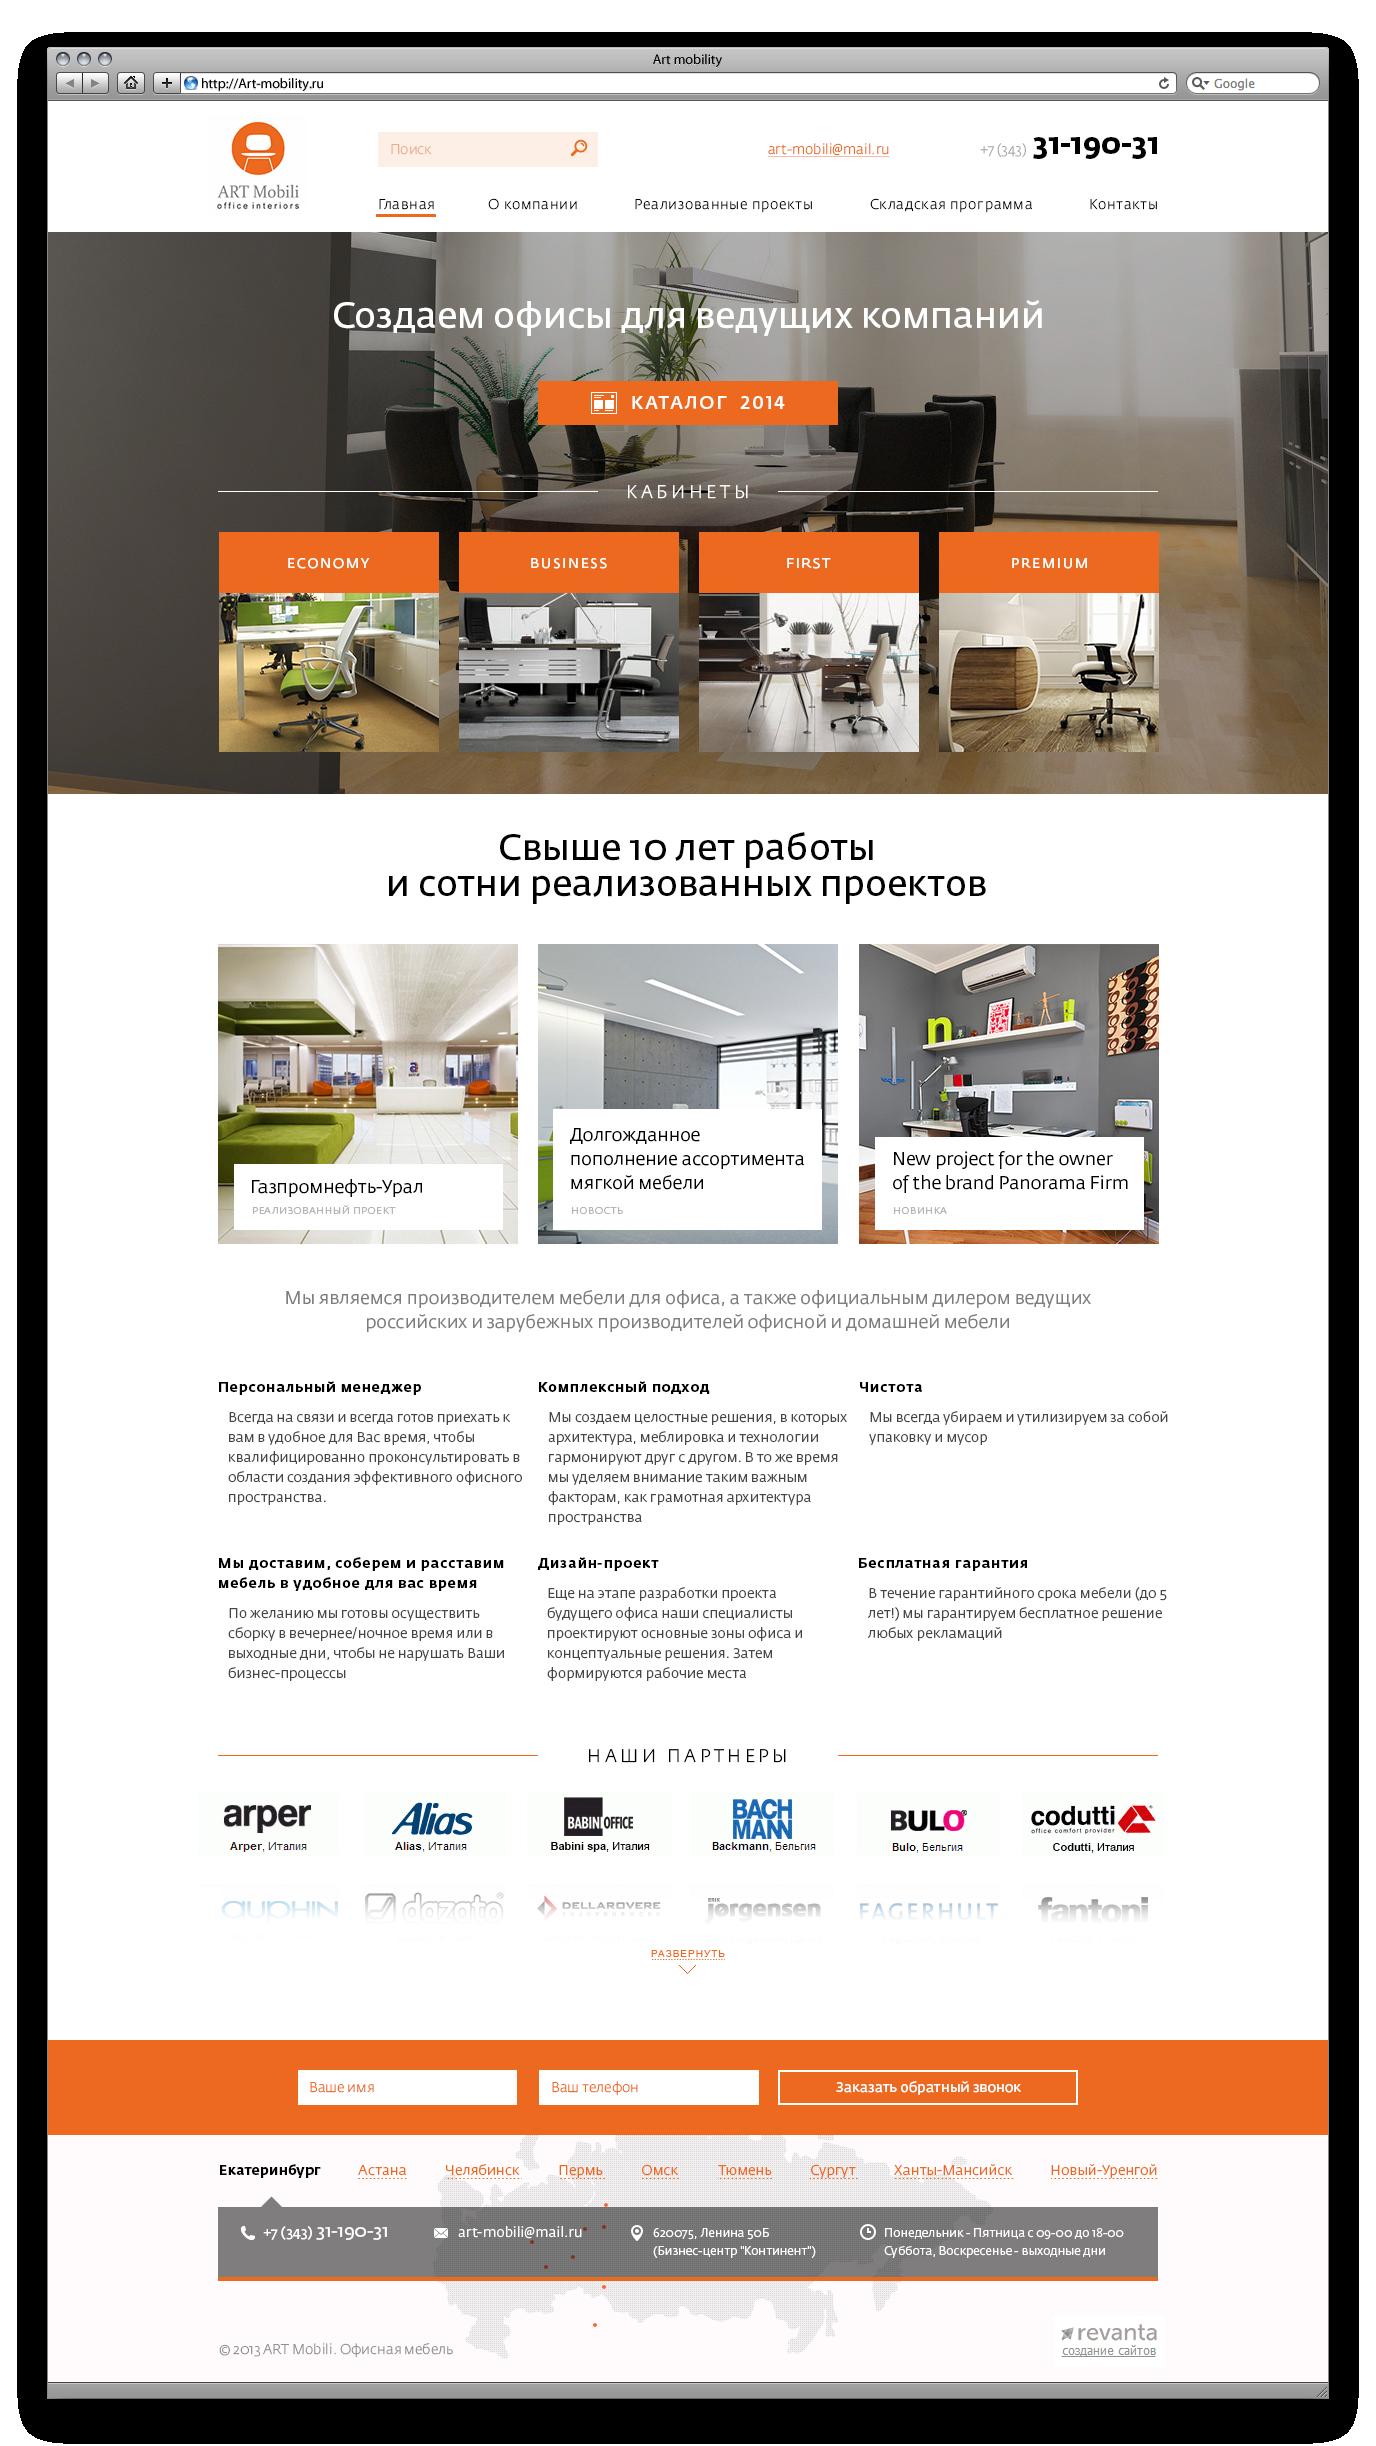 Дизайн сайтов за 2015 год